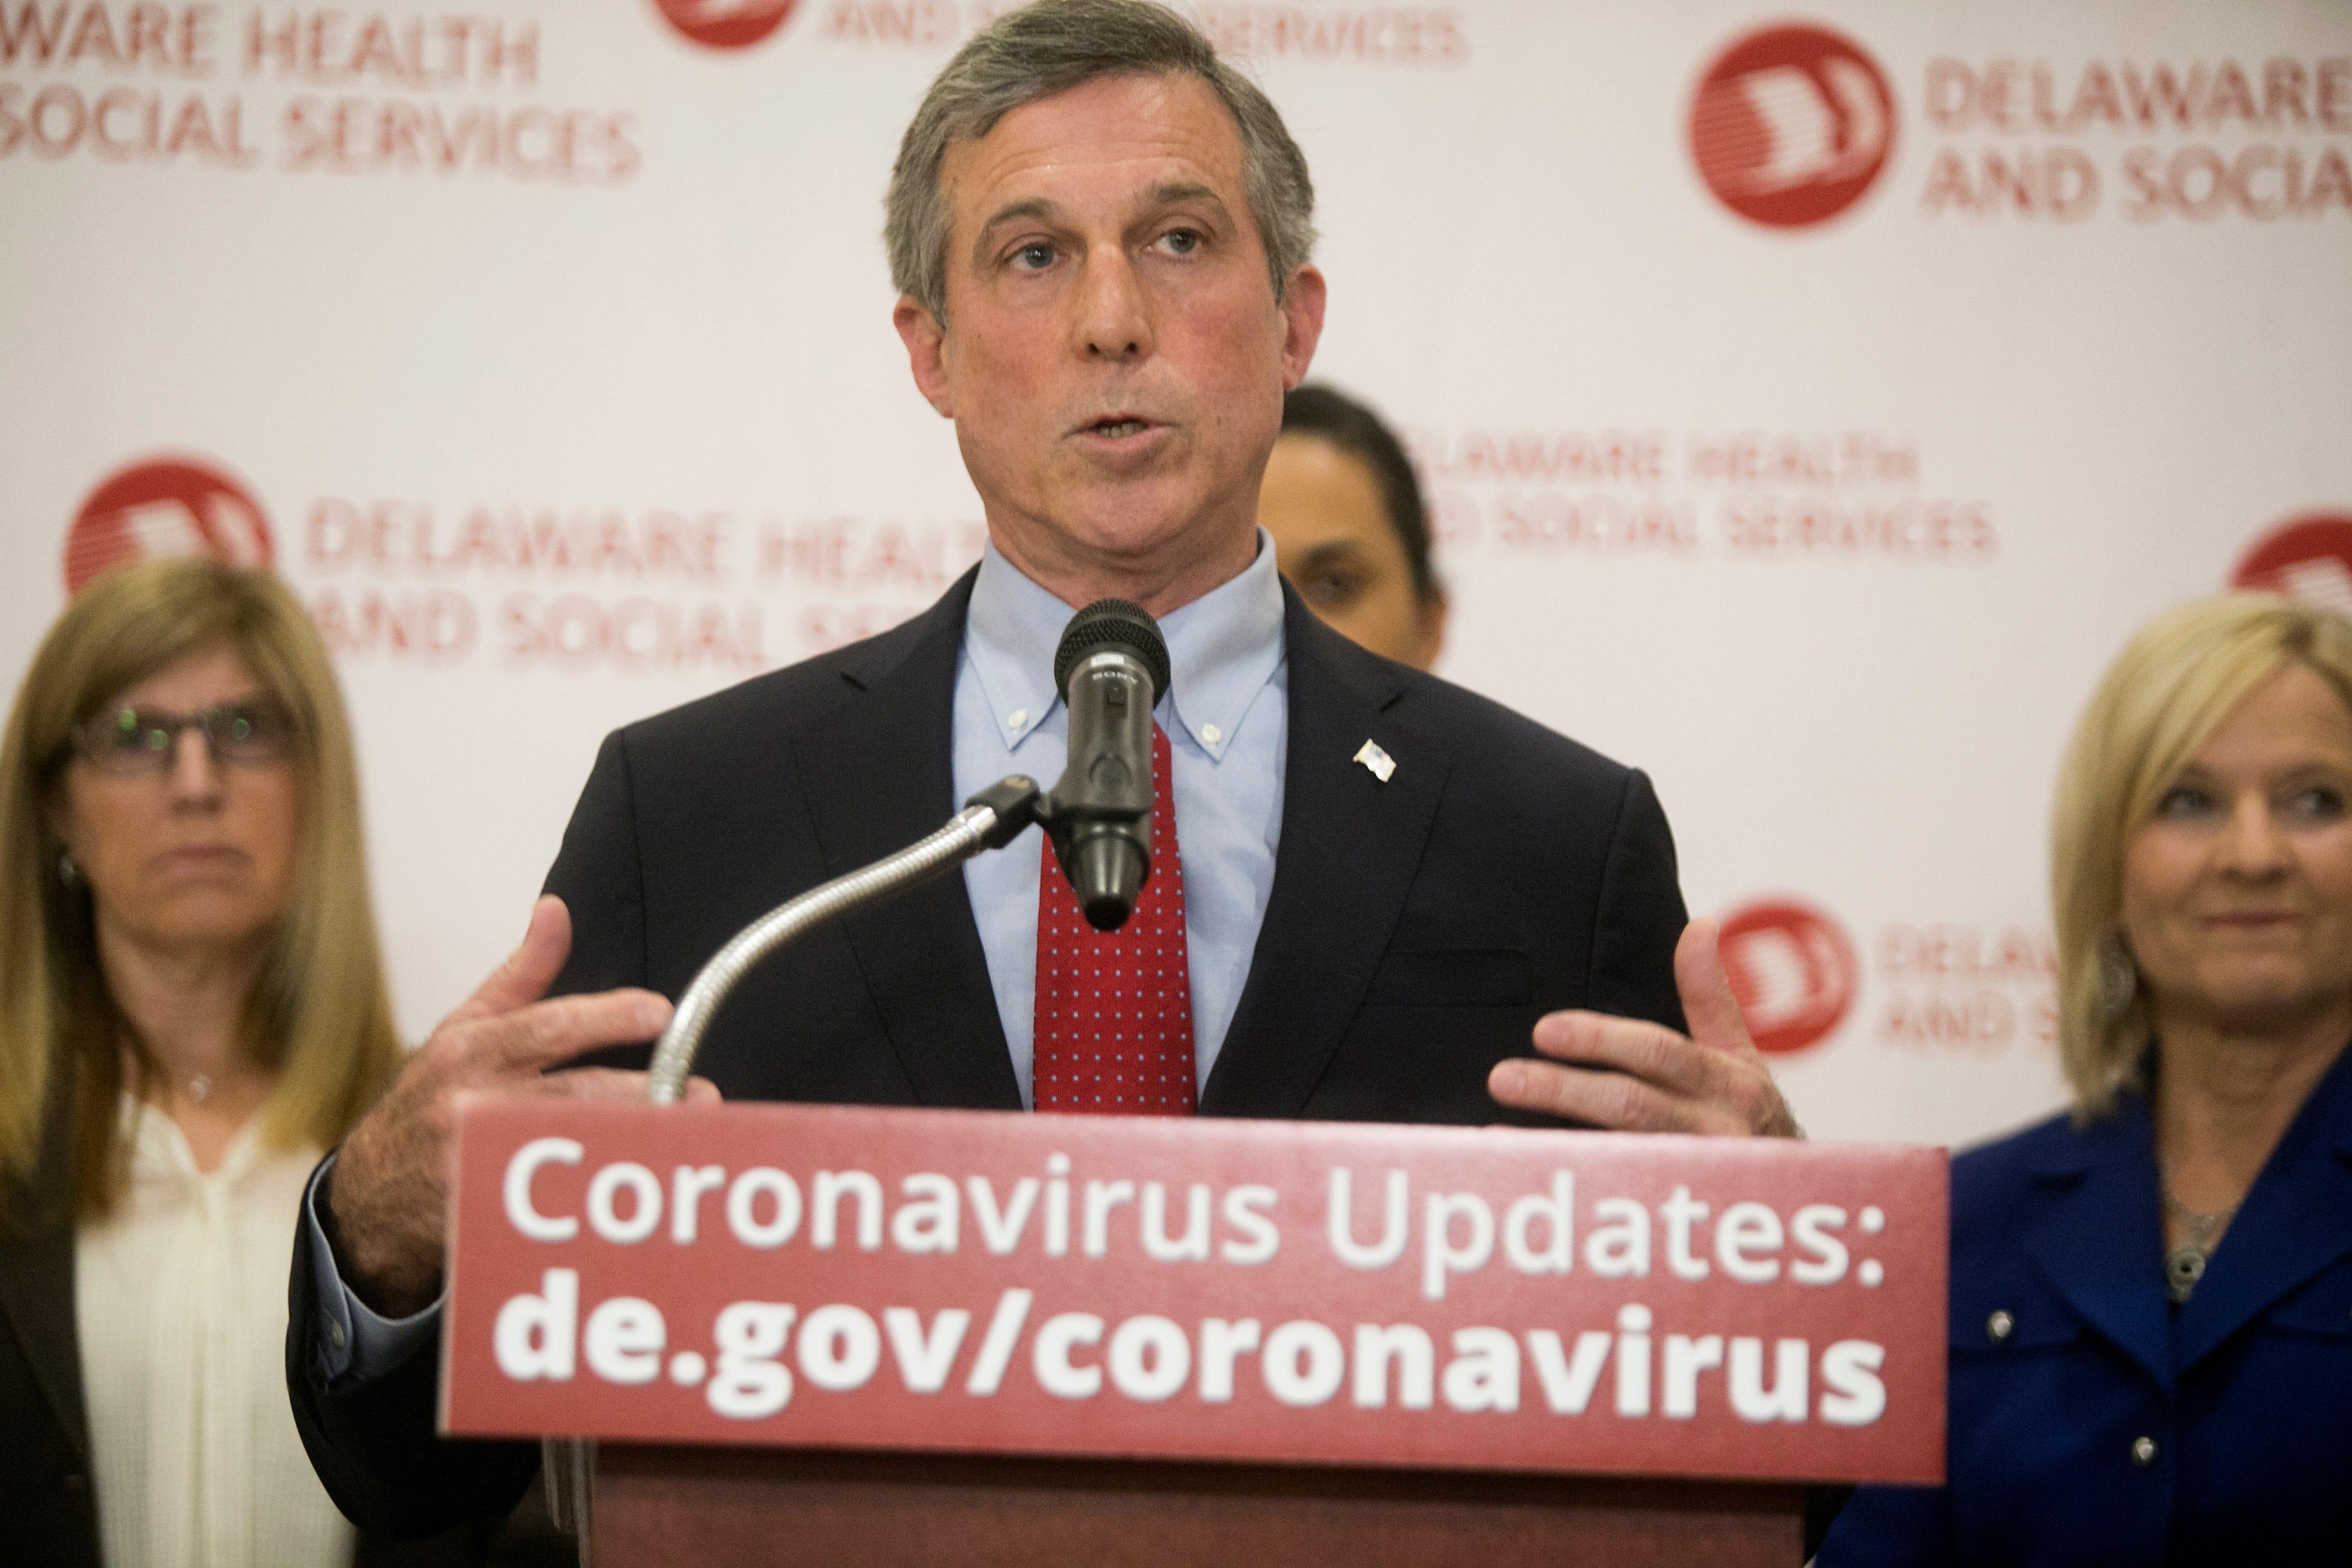 Ud Faculty Member 1St In Delaware Diagnosed With Coronavirus: Officials  Speak Regarding Delaware State Spring Break